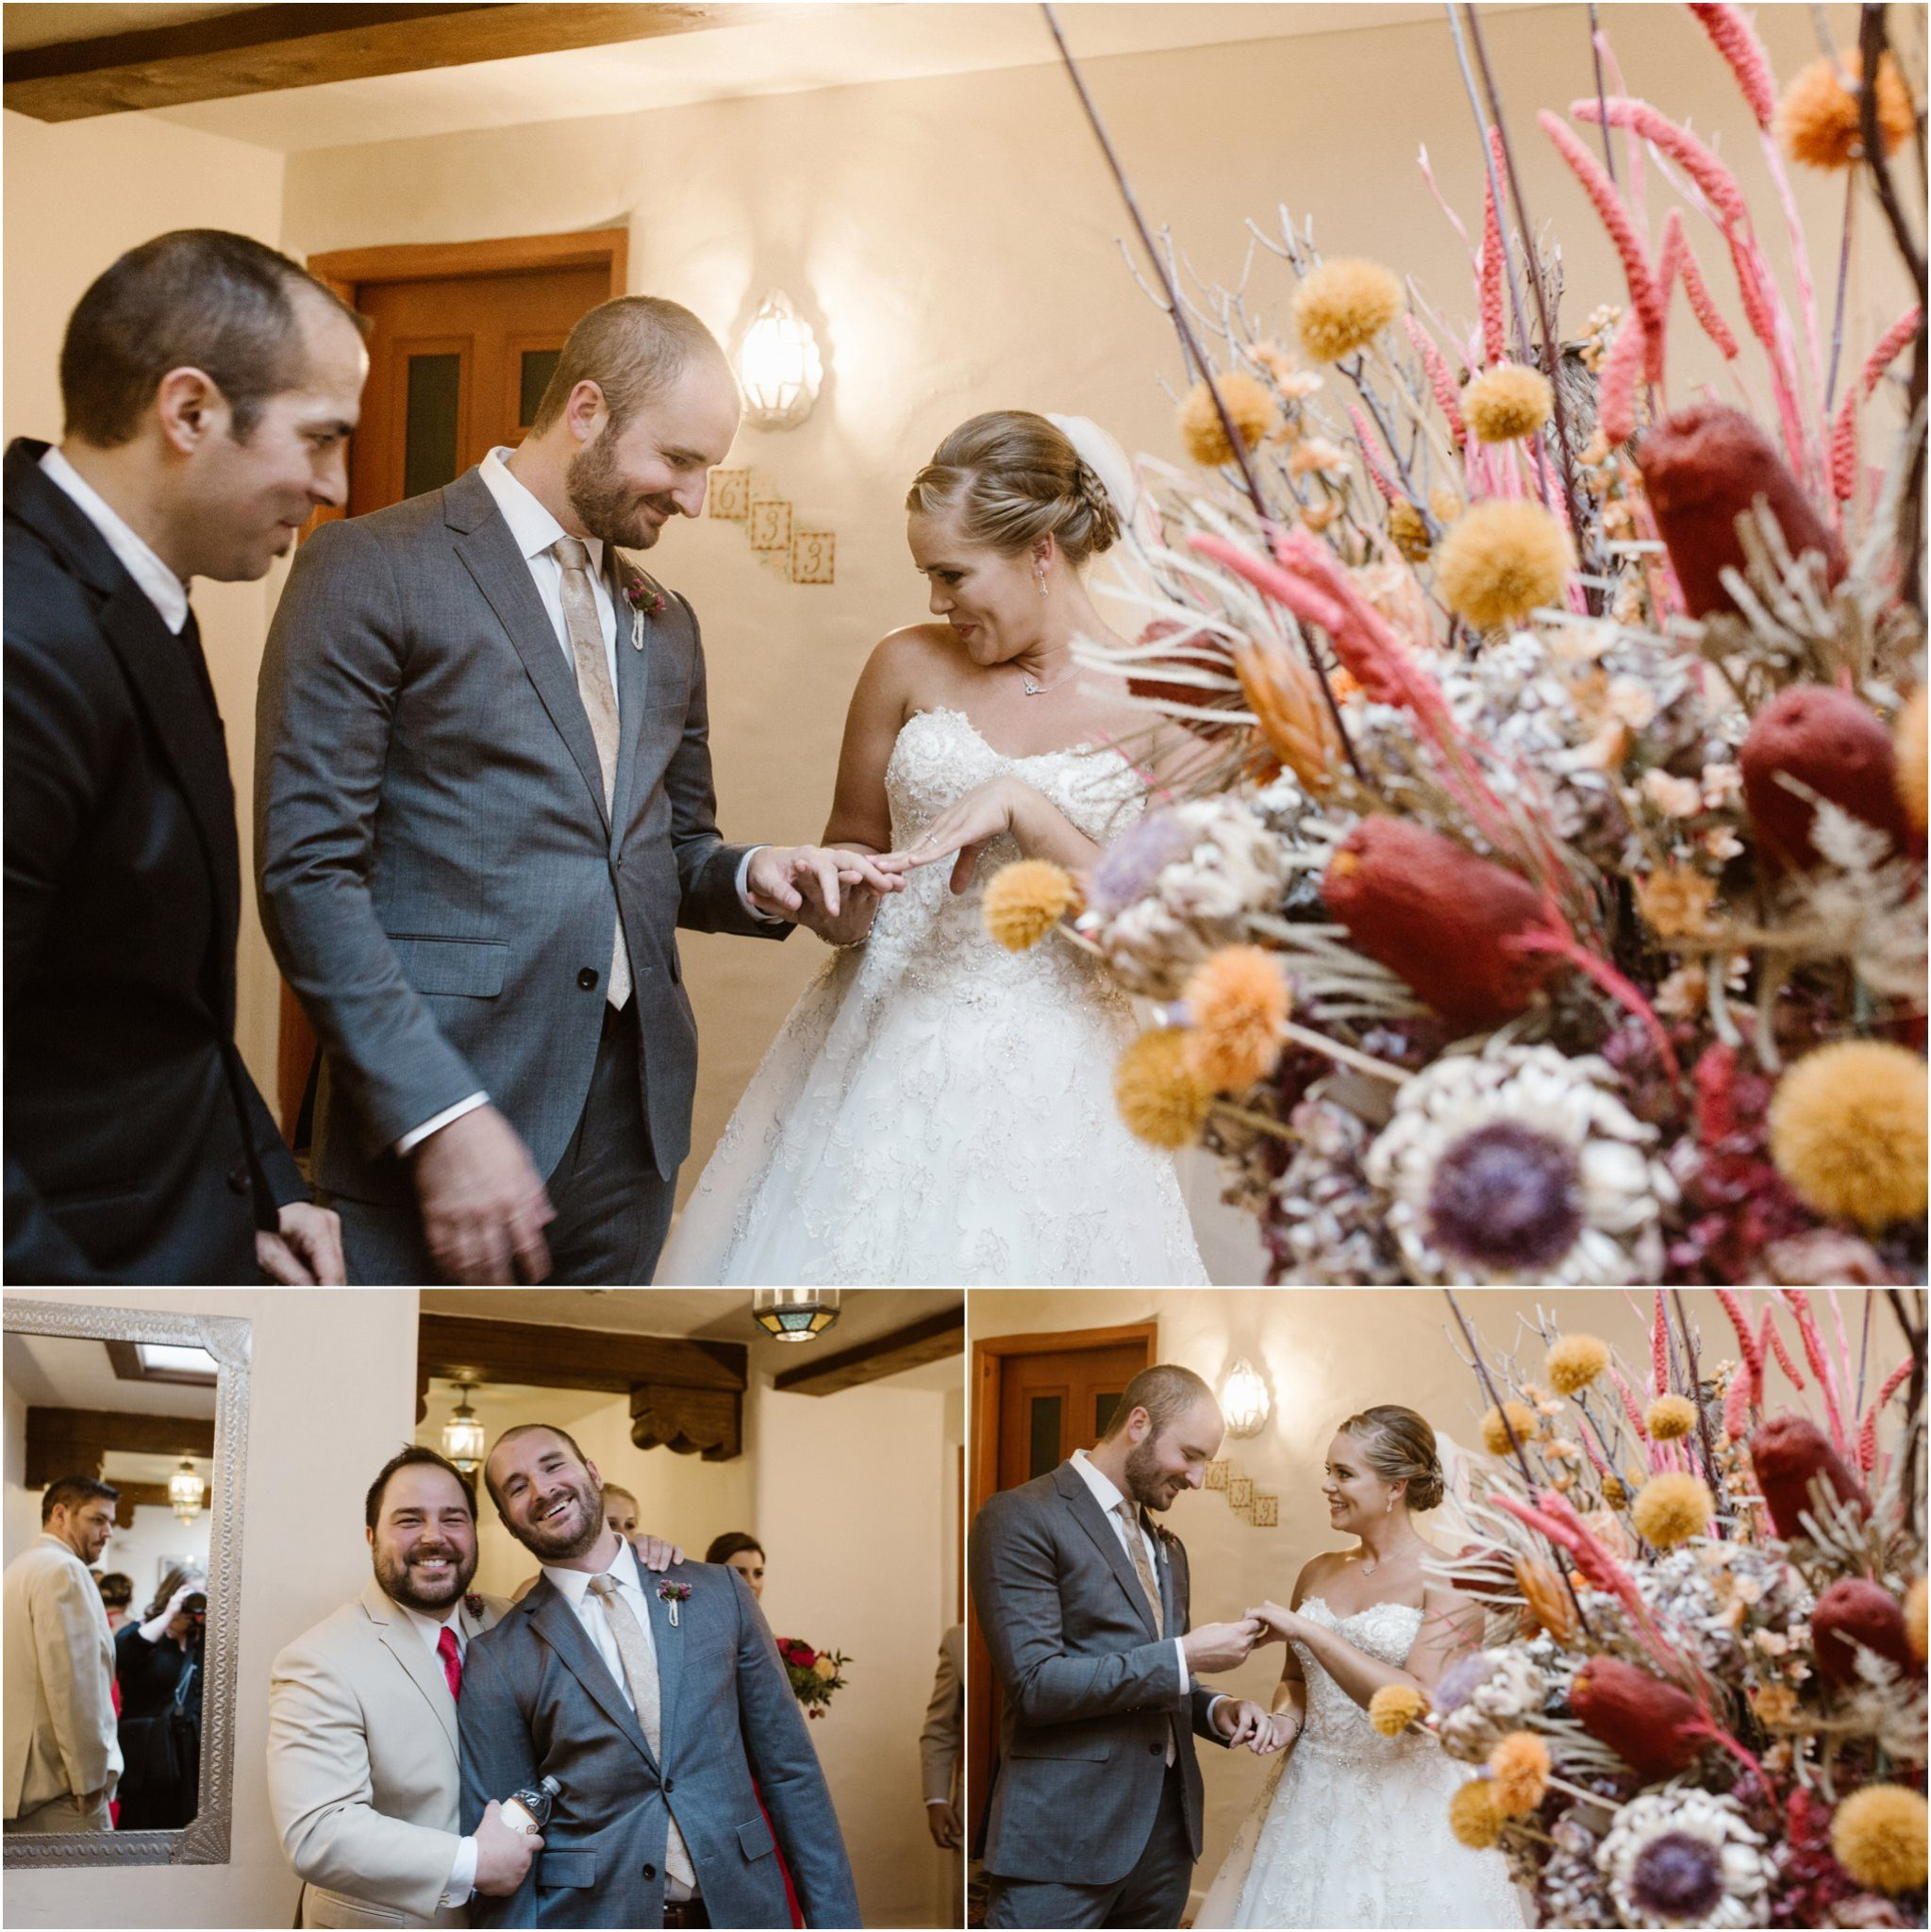 Albuquerque Wedding Photographers: Albuquerque Wedding Photographer